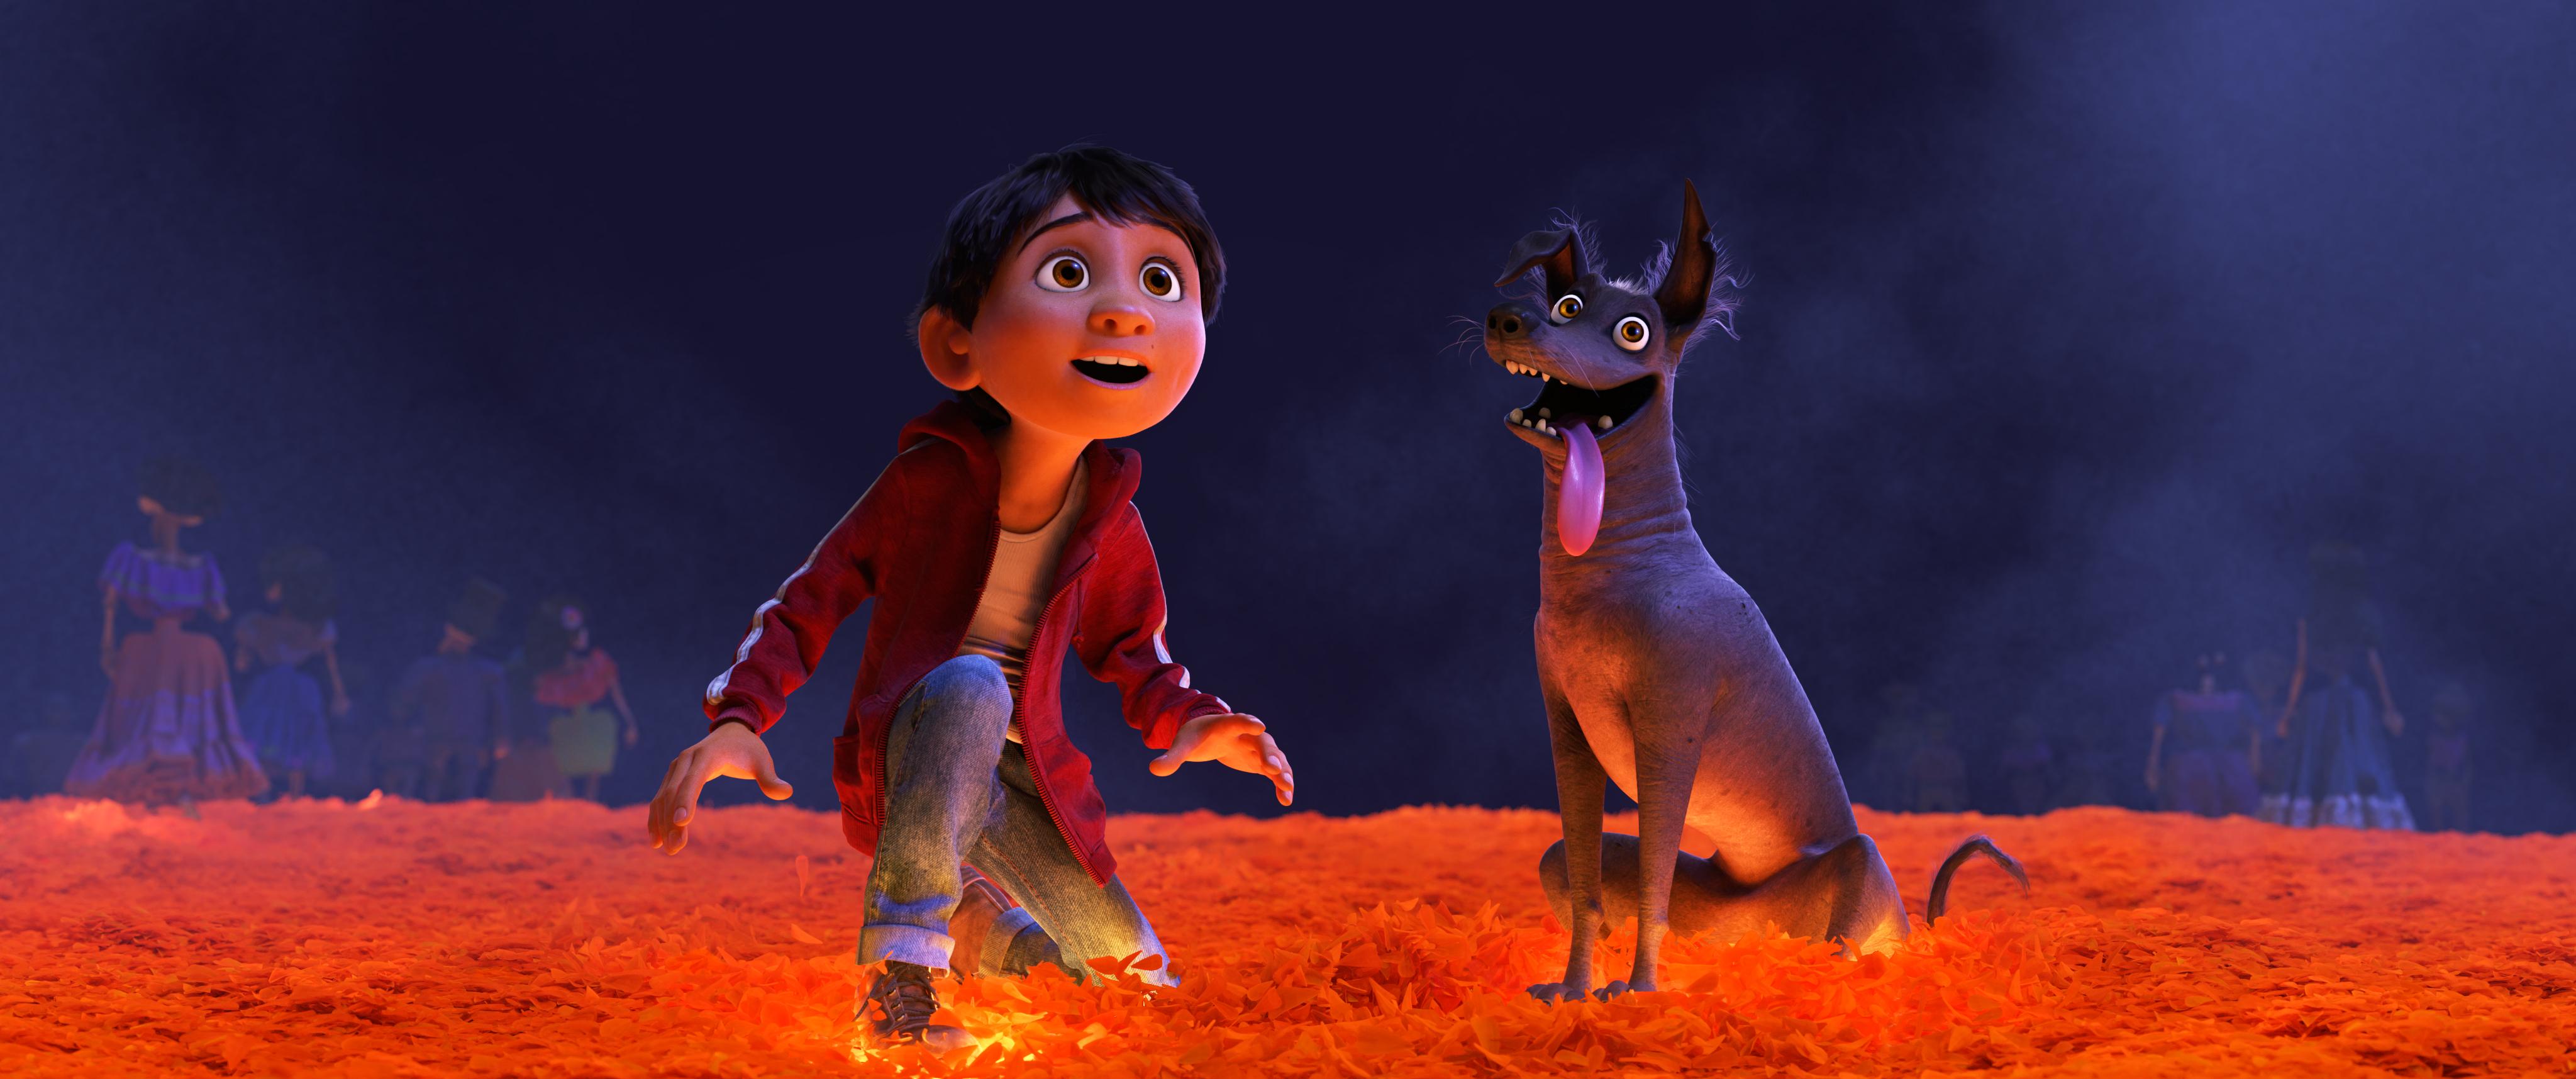 Disney·Pixar's COCO - New Teaser Trailer